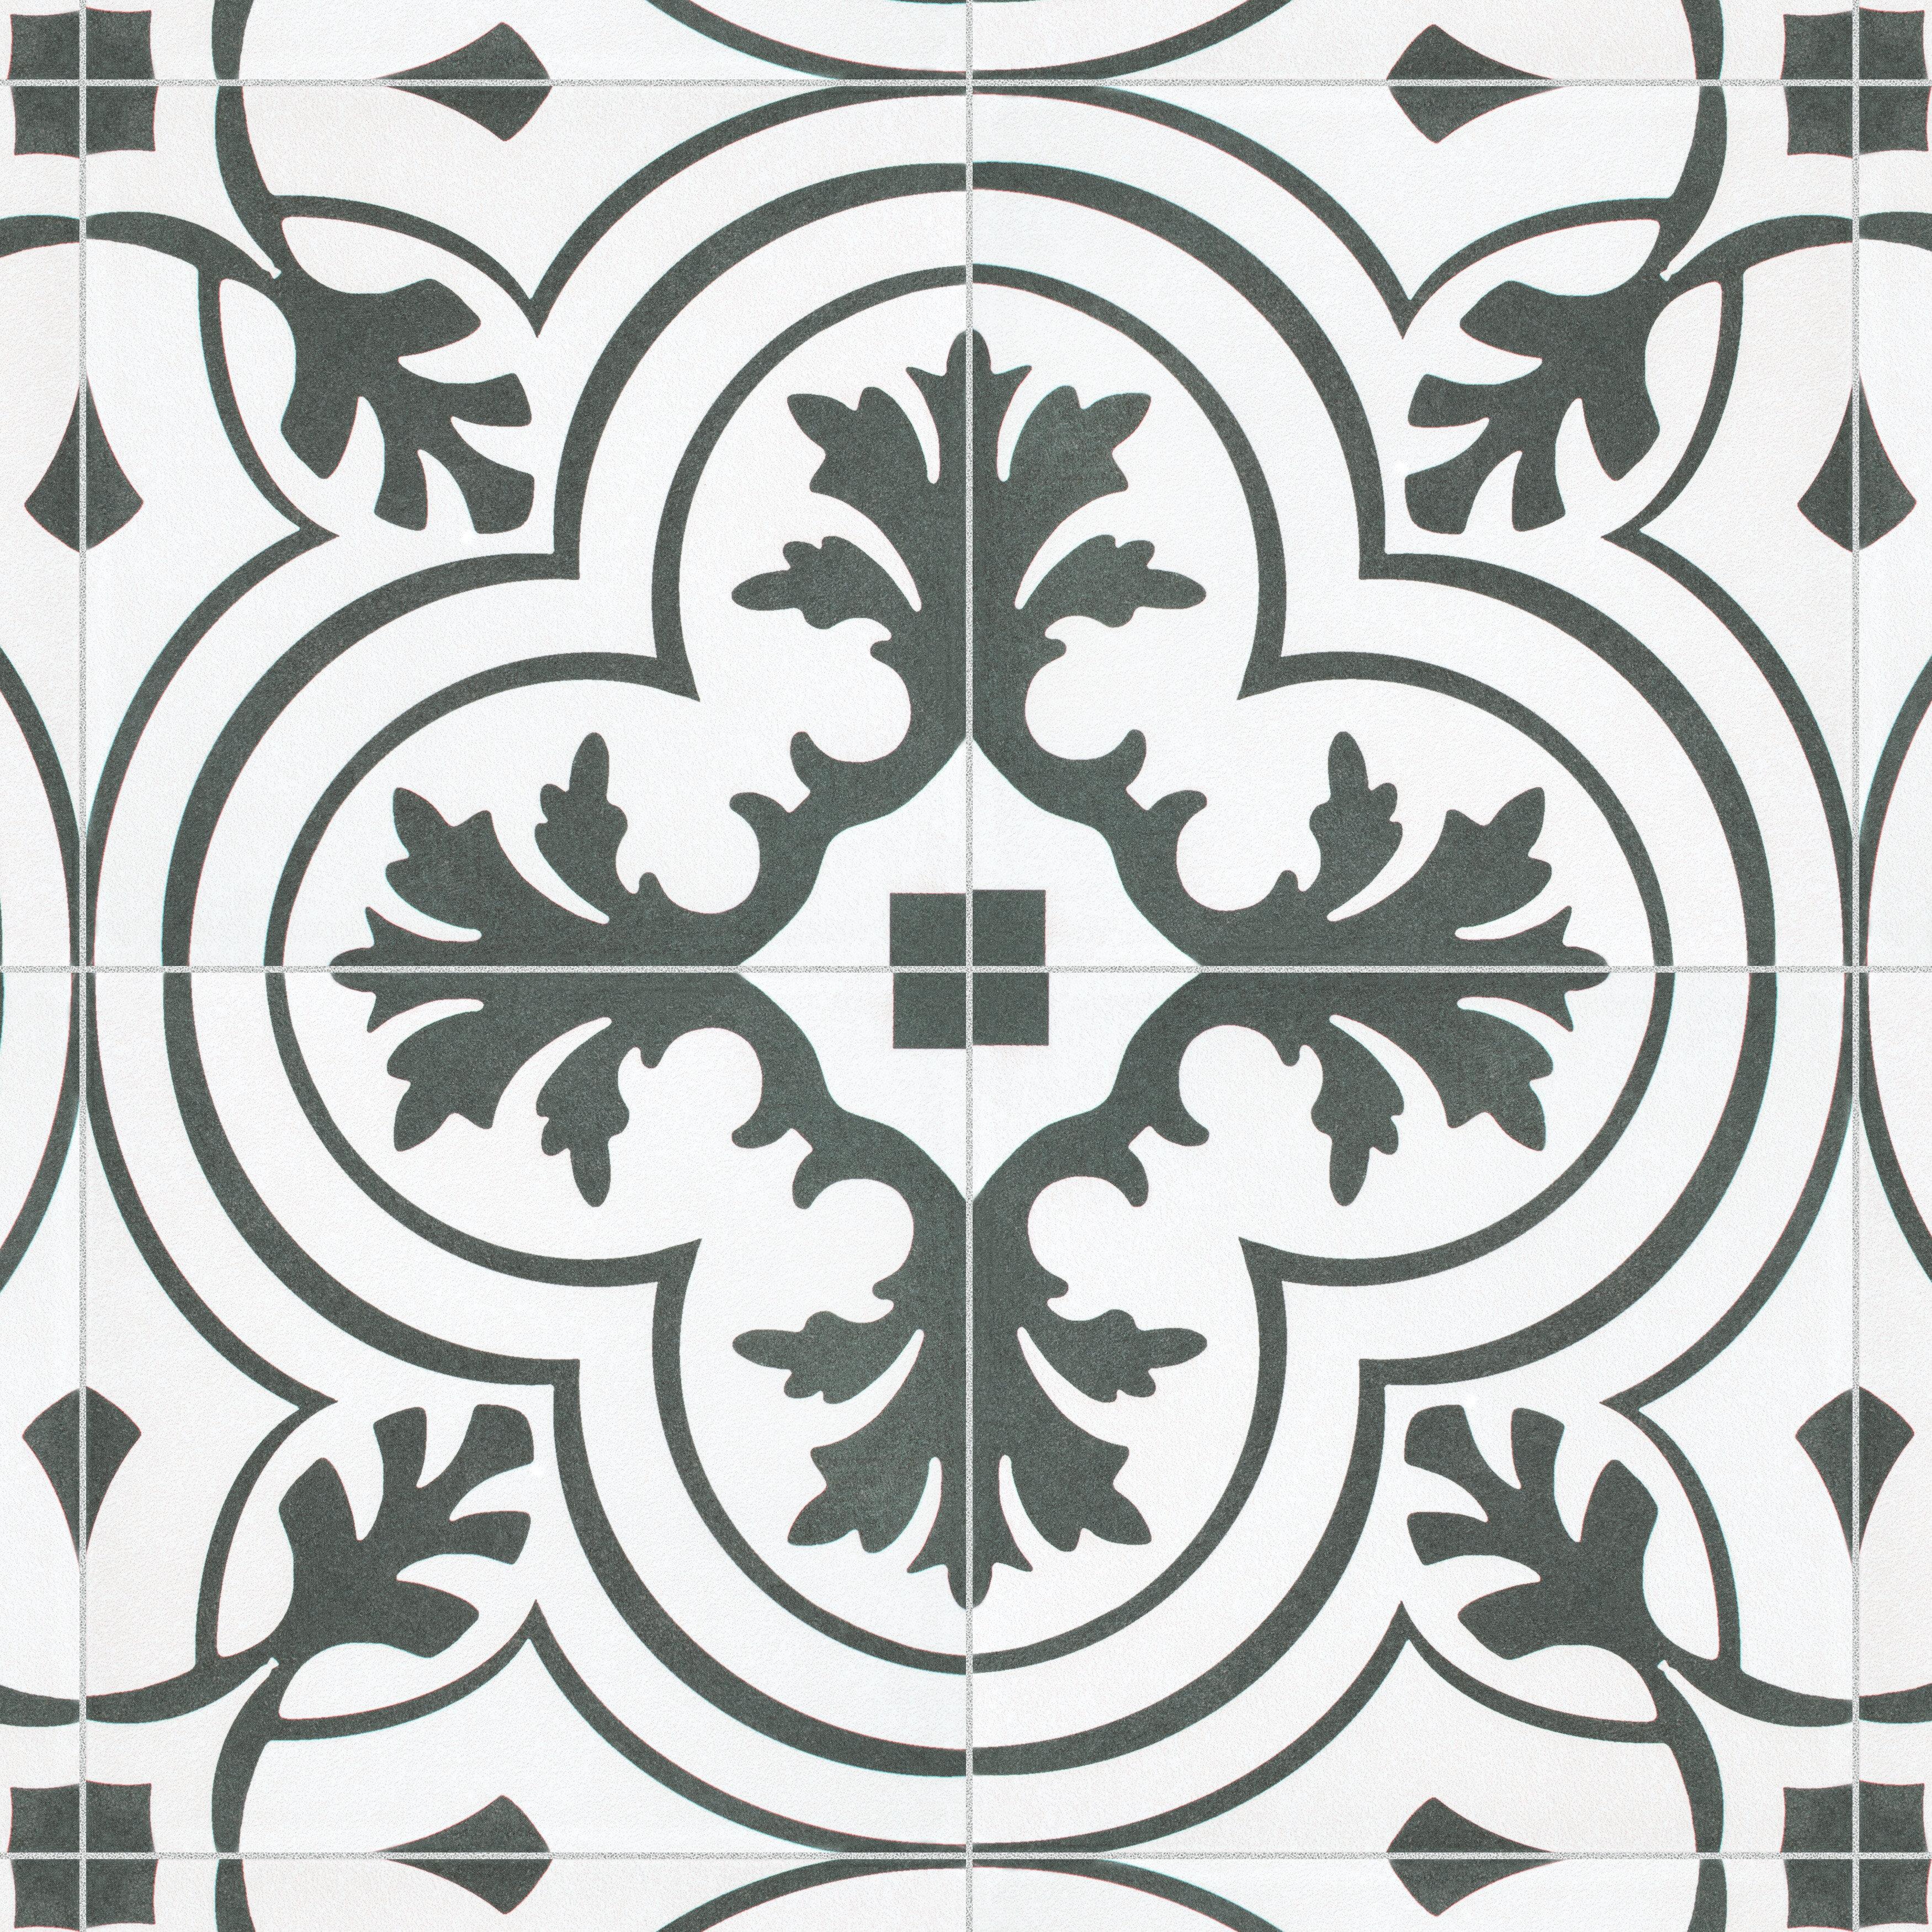 8X8 Antique White Matte Porcelain Stoneware Tile Bathroom Kitchen Entryway